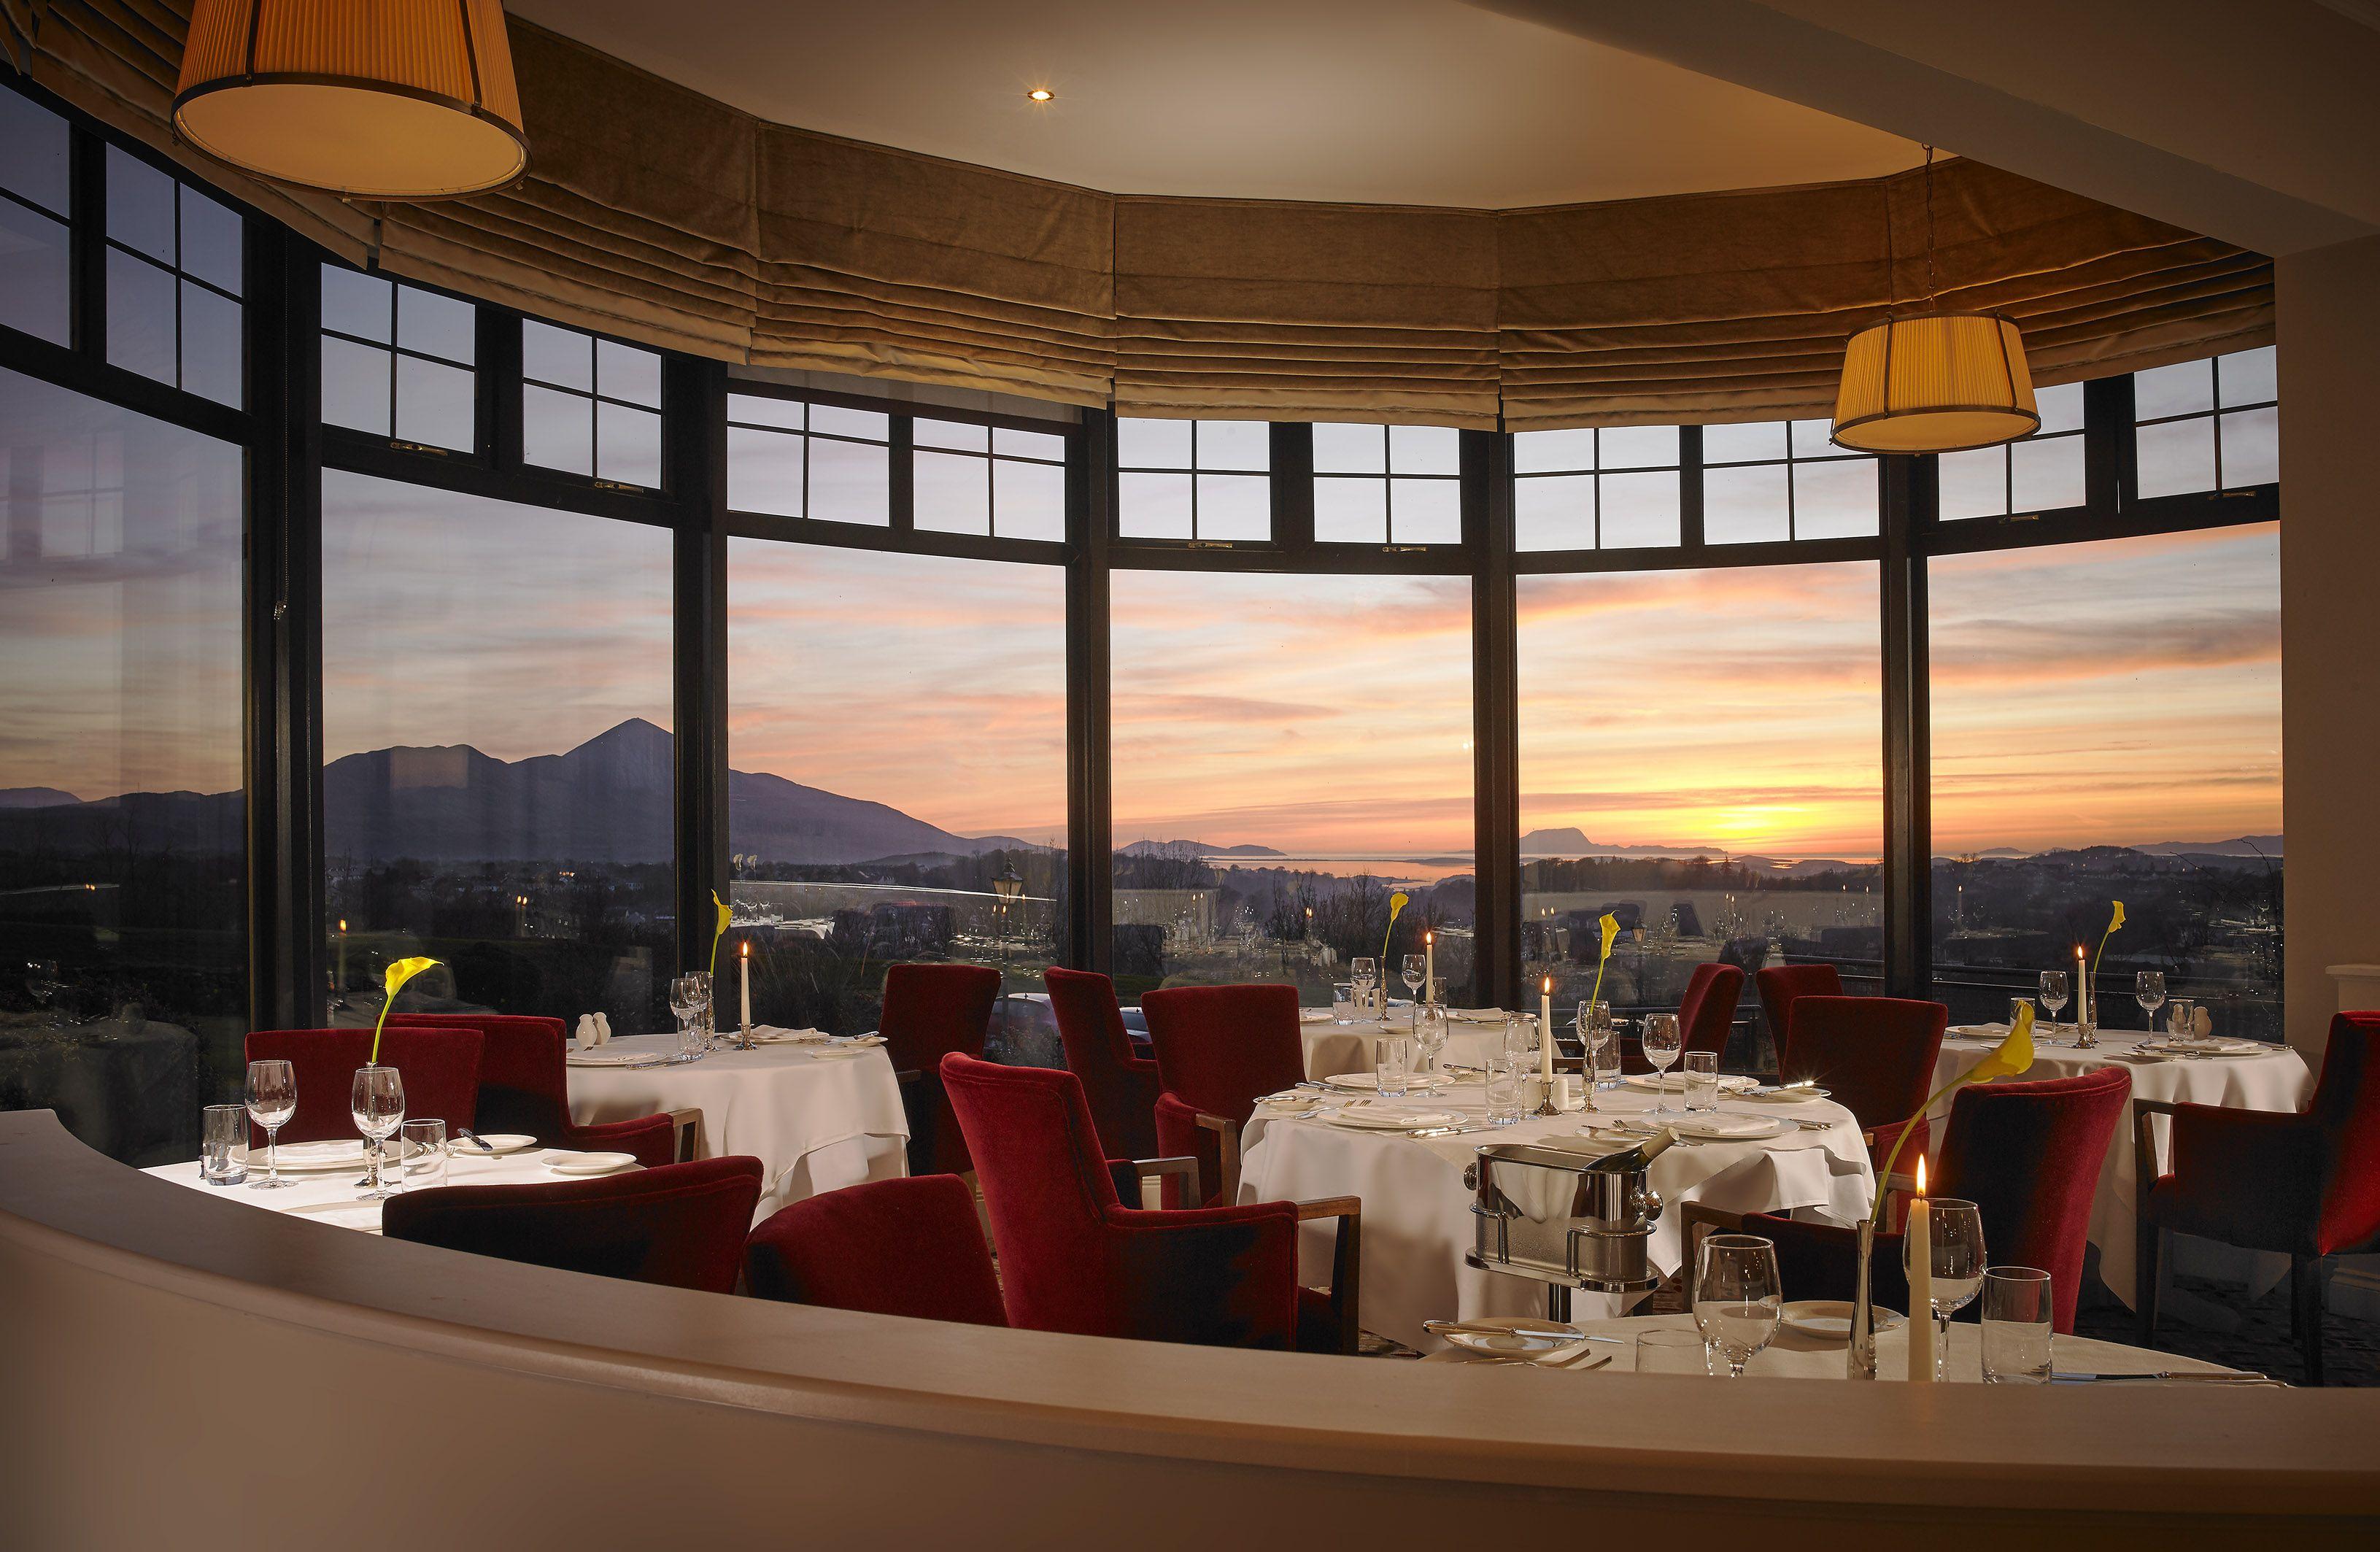 La_fouge_re_restaurant_at_sunset_-_knockranny_house_hotel